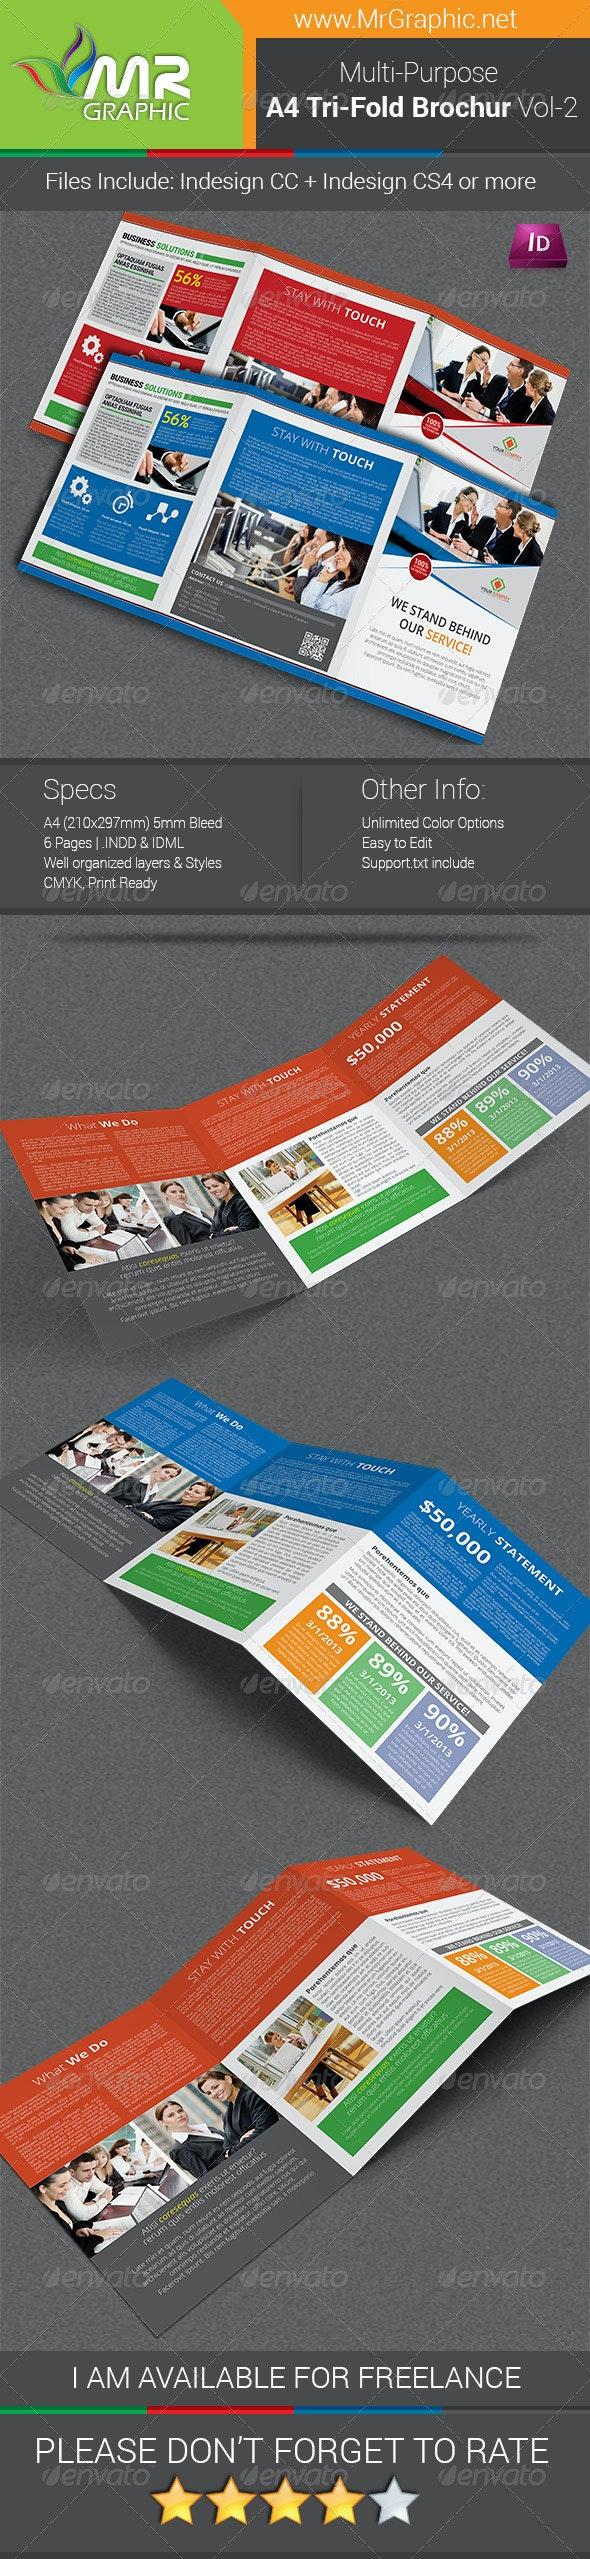 Multipurpose A4 Tri-Fold Brochure Template Vol-2 - Corporate Brochures